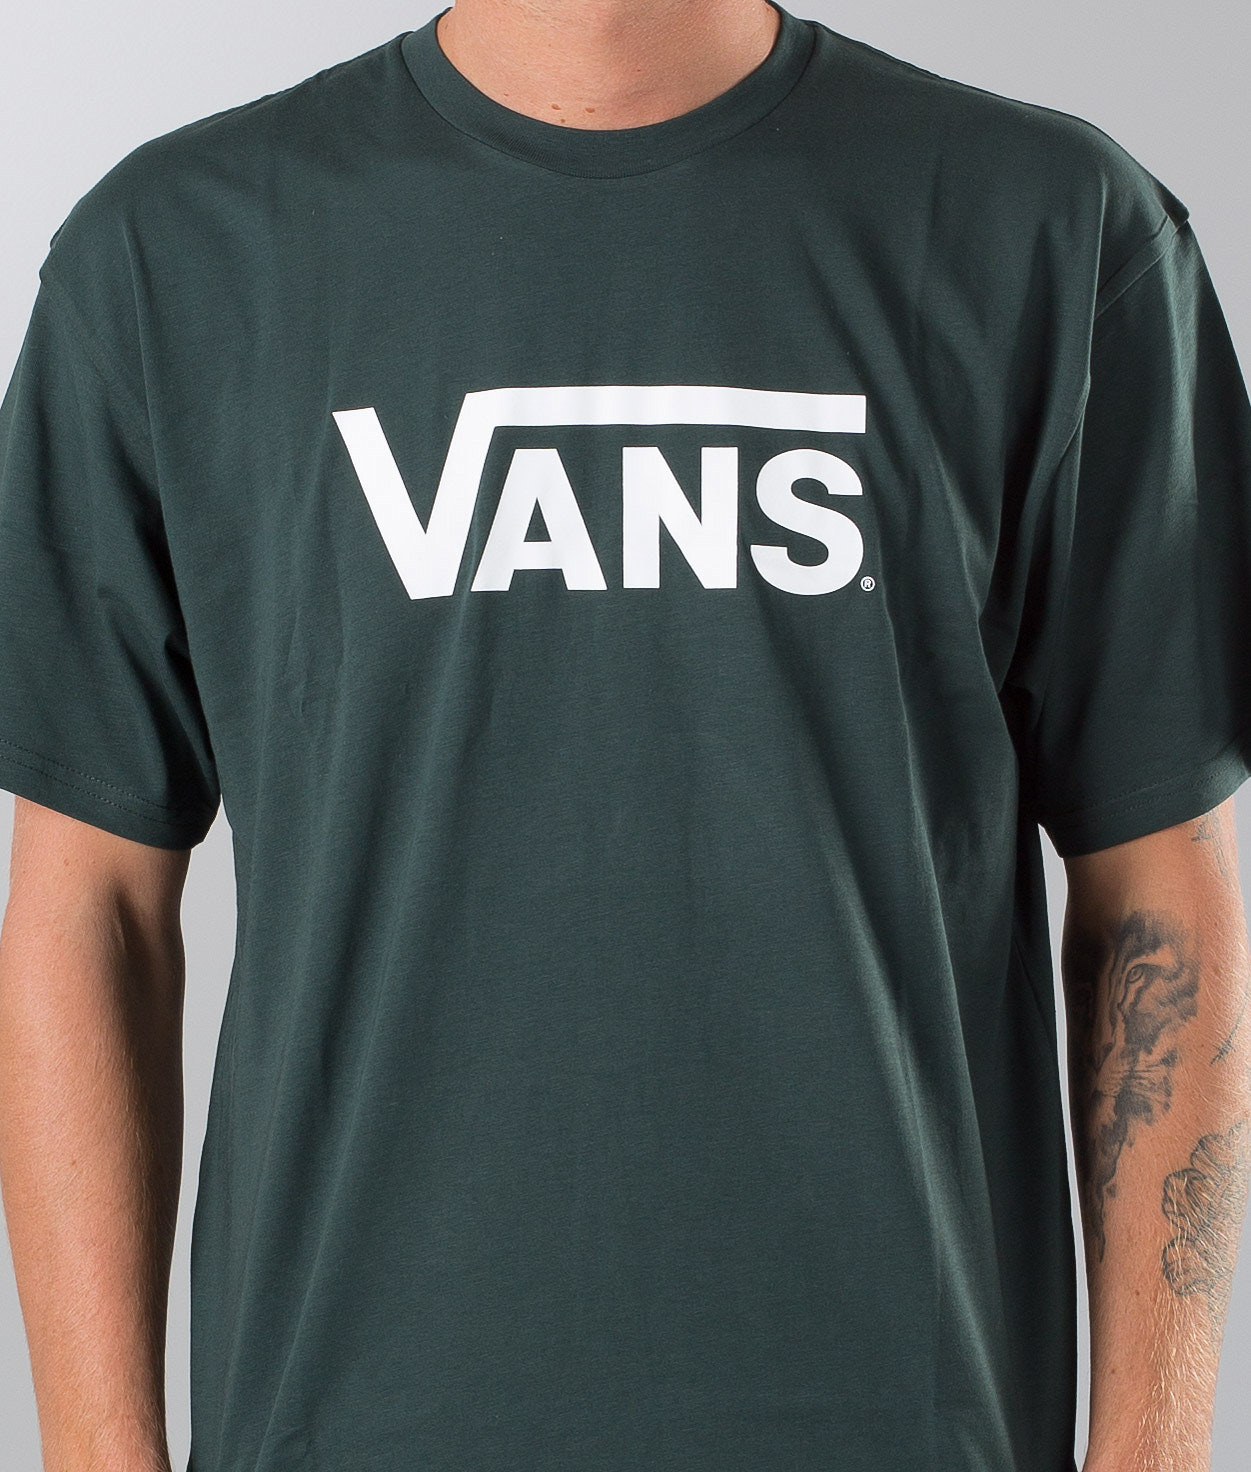 d7caa4dbfecaa5 Vans Vans Classic T-shirt Darkest Spruce-White - Ridestore.com